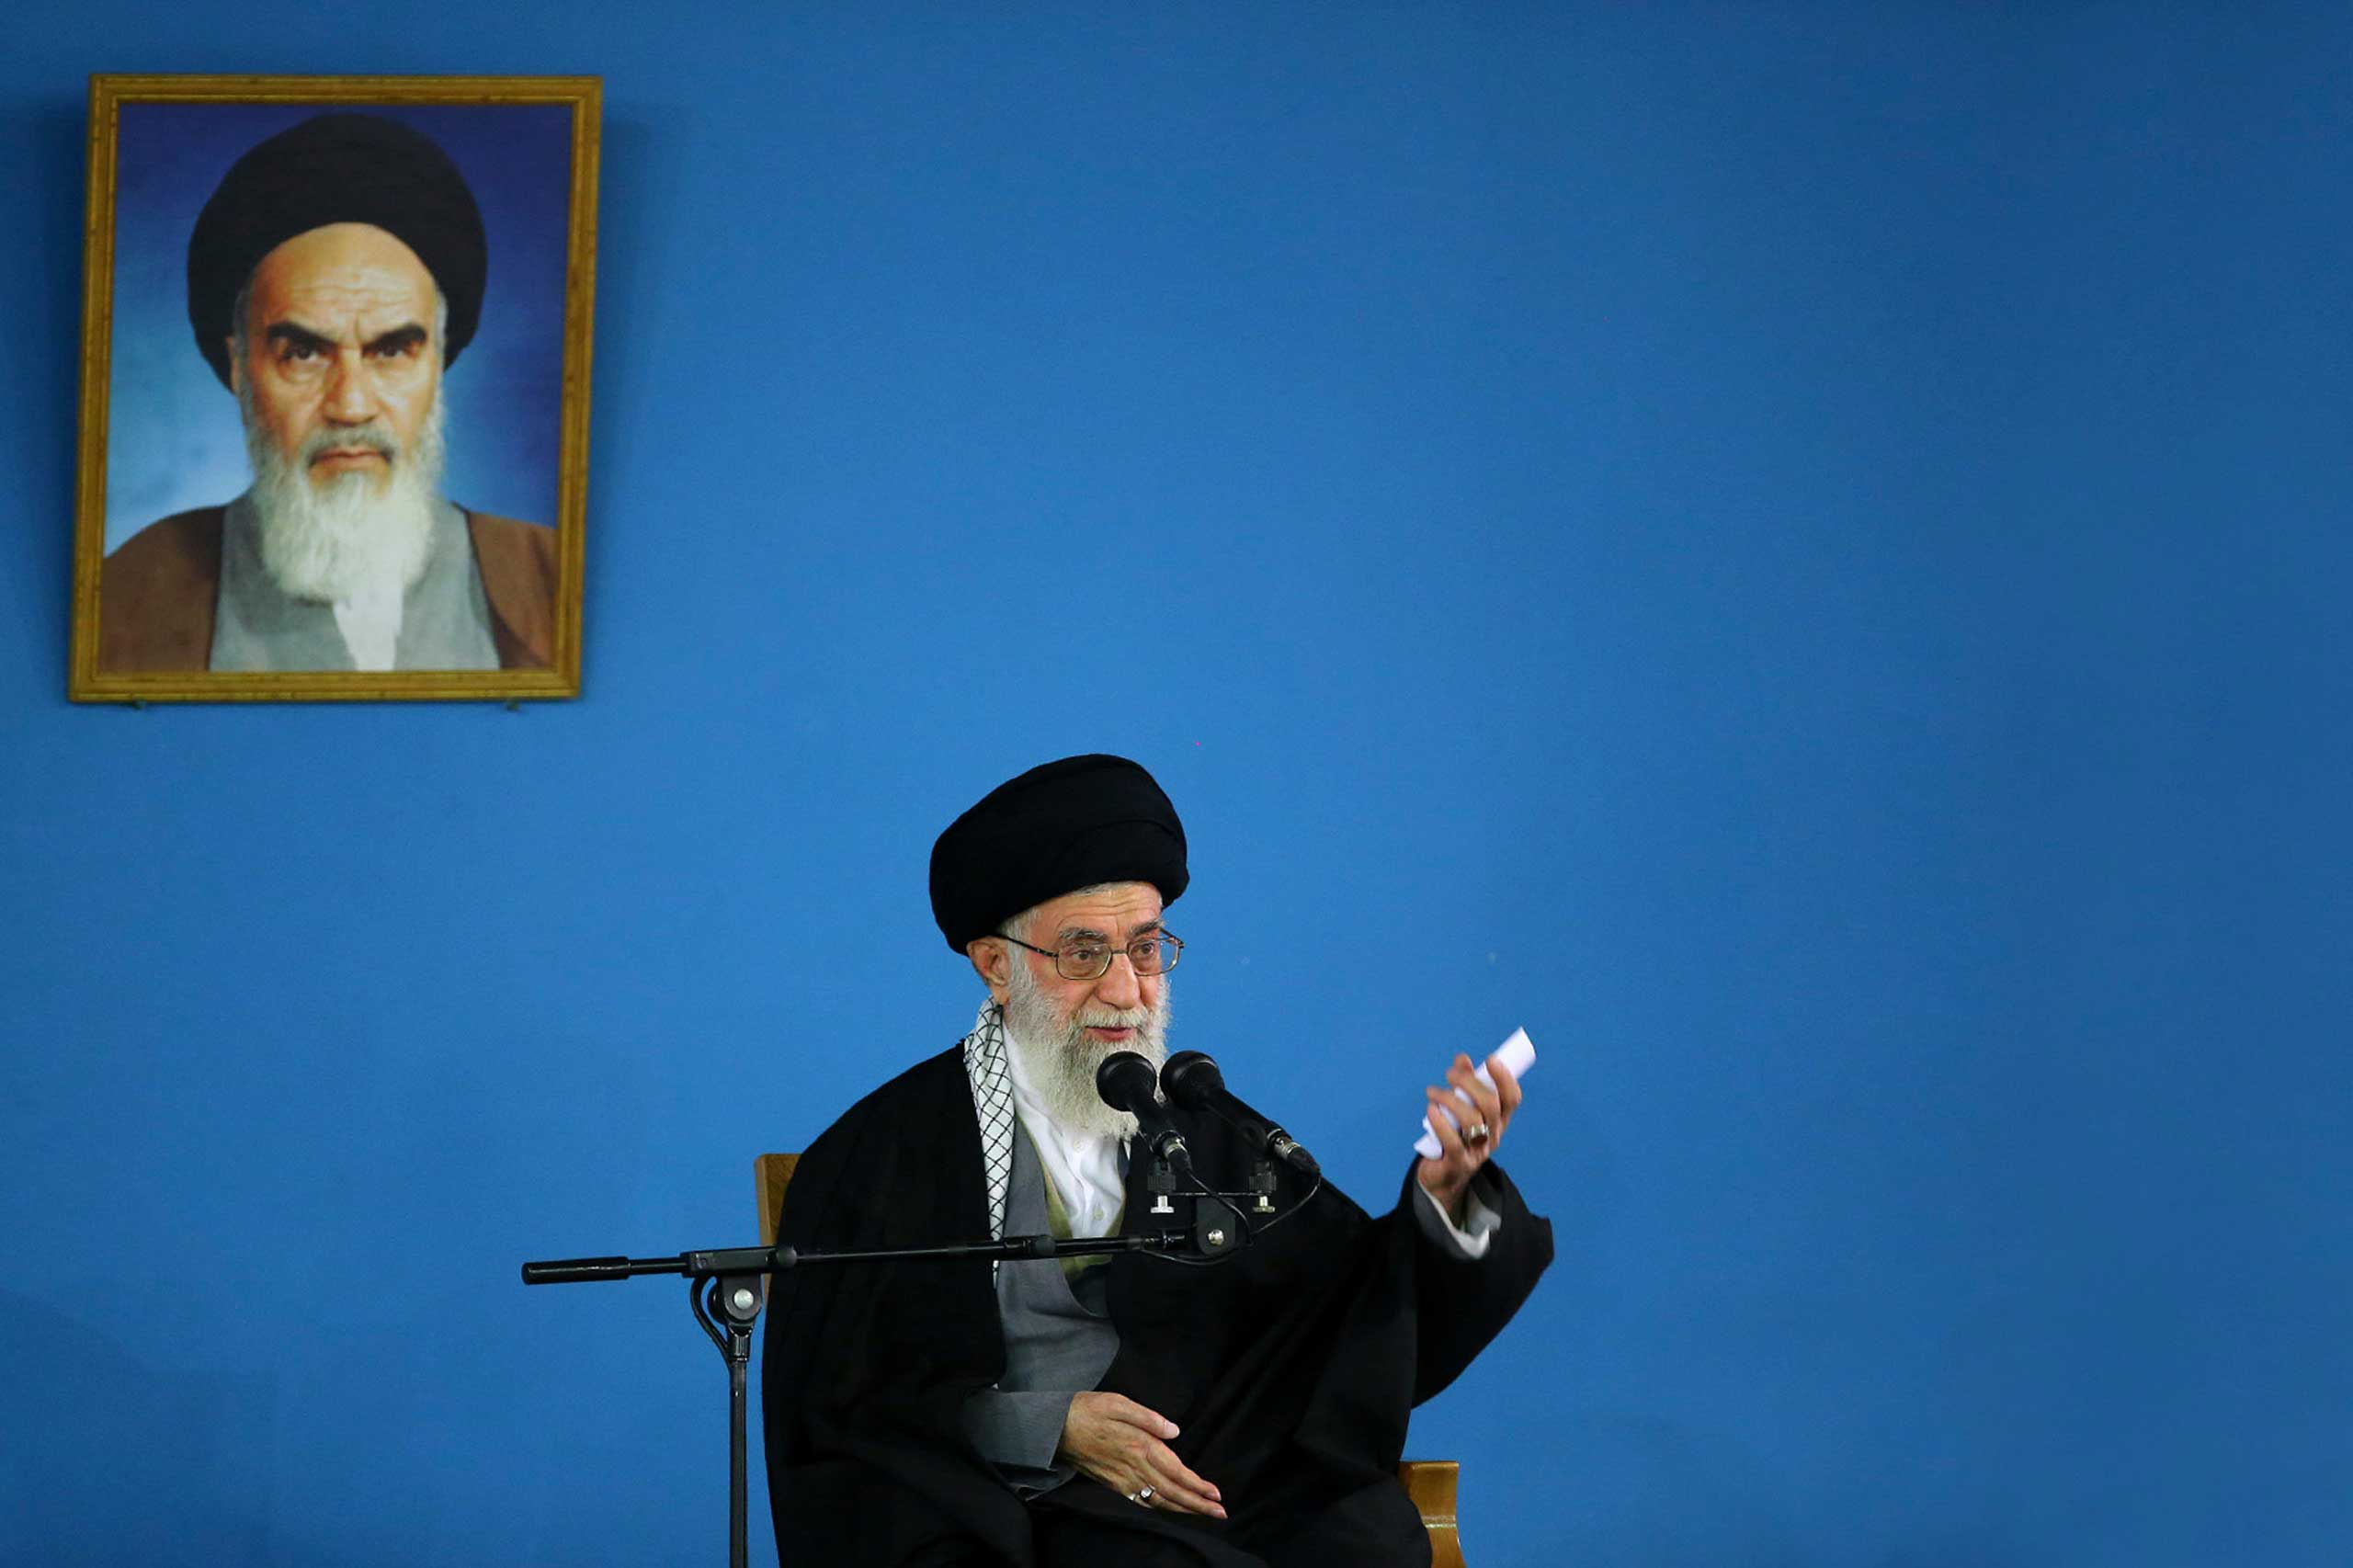 Supreme Leader Ayatollah Ali Khamenei speaks at a public gathering at his residence in Tehran,  Jan. 7, 2015.